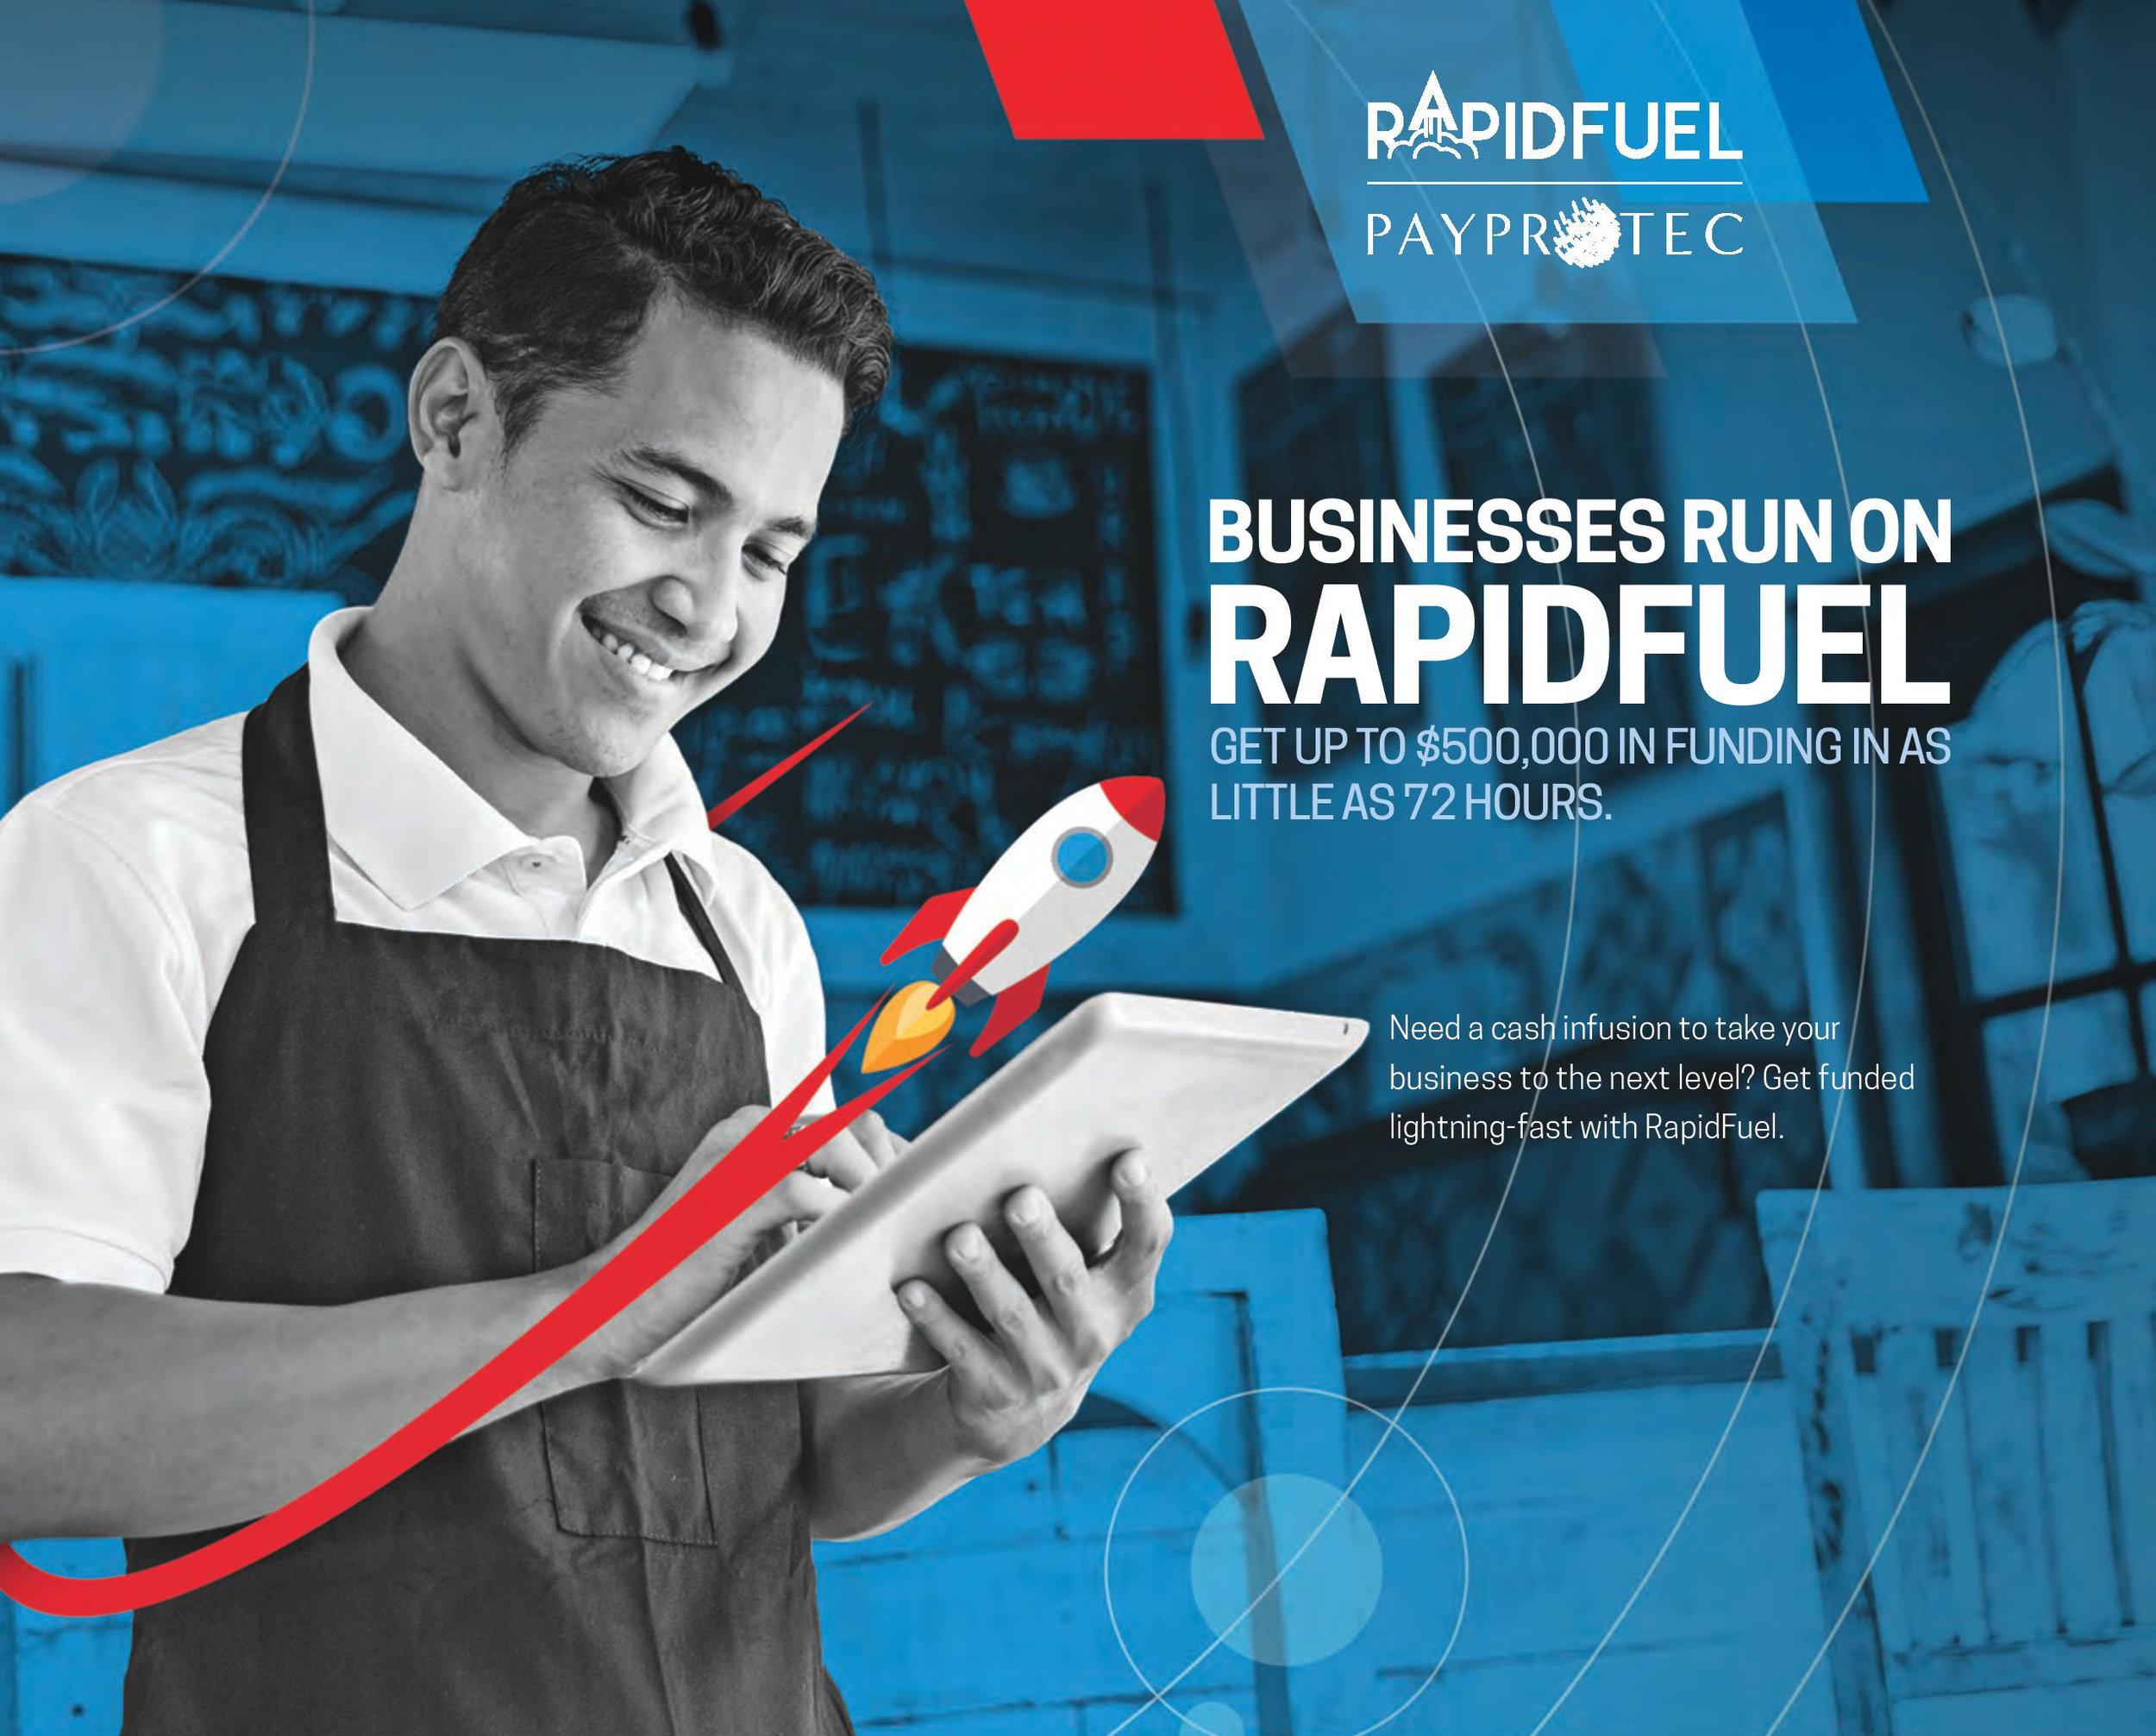 RCF_RapidFuel_PPT-p1_Banner.jpg